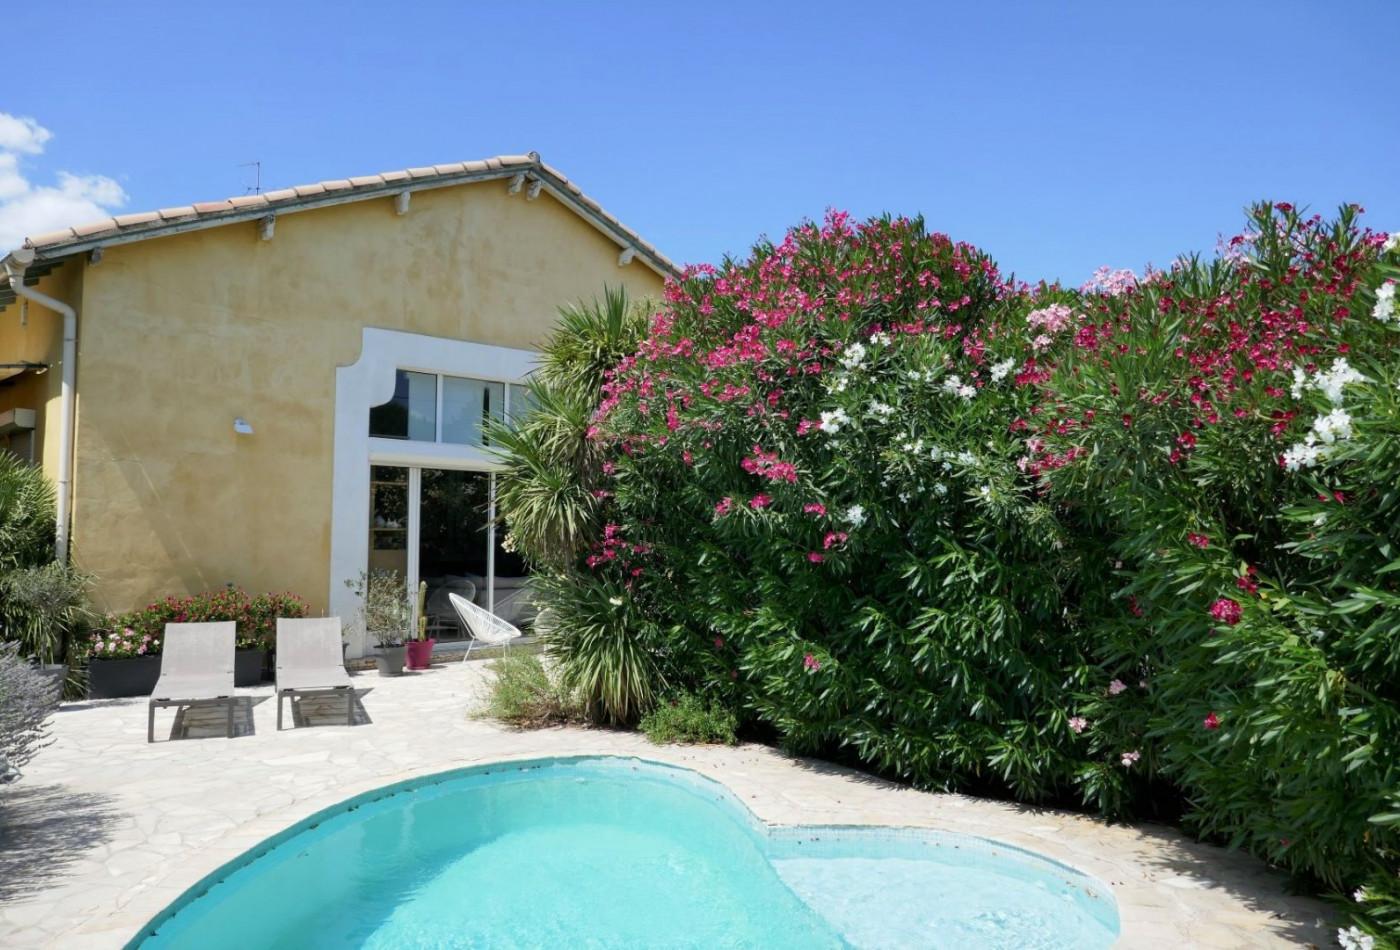 A vendre  Montpellier   Réf 340148650 - Agence galerie casanova